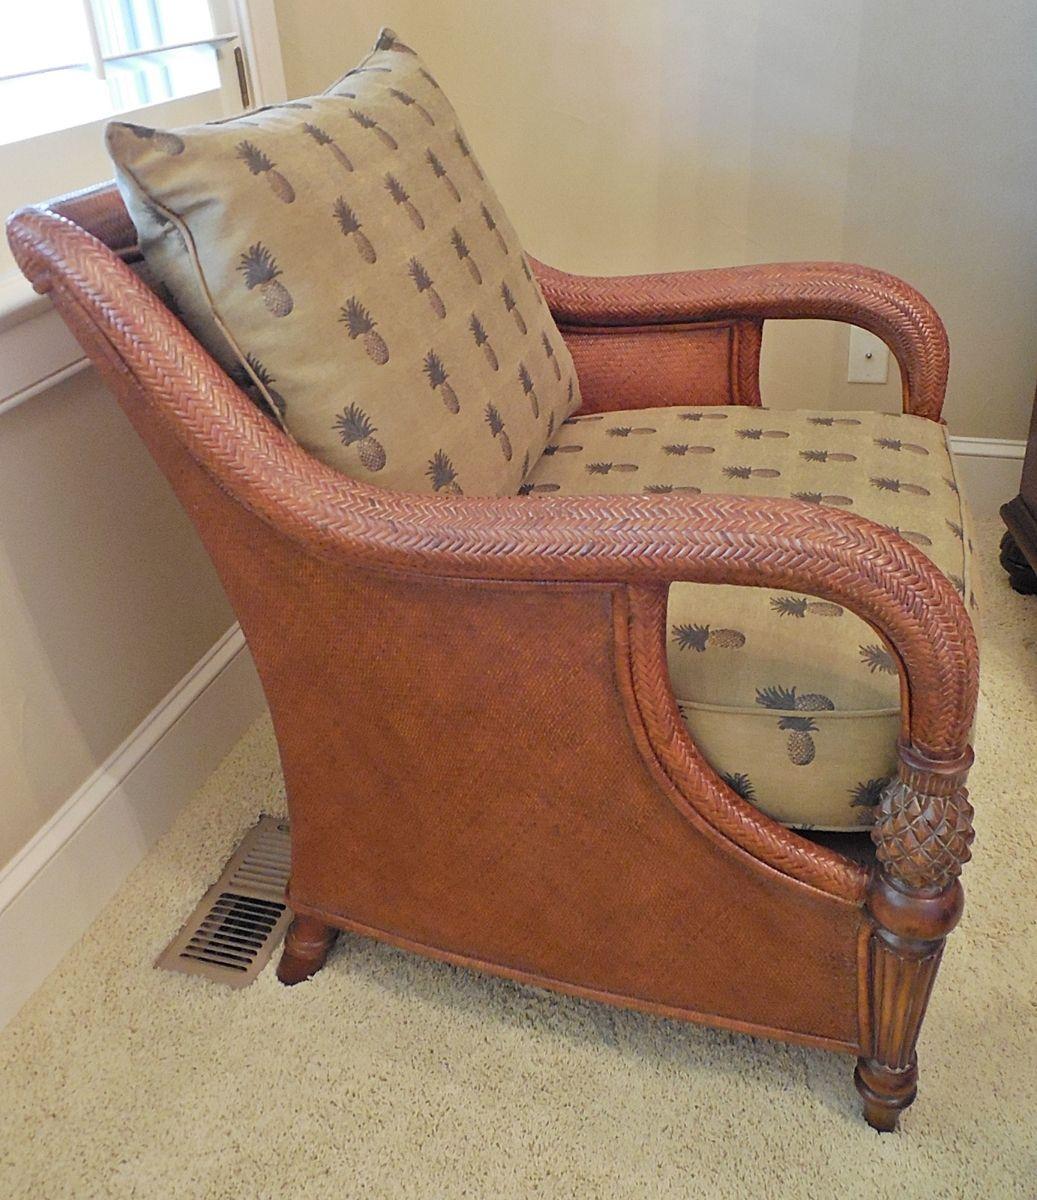 Genial Jabberwocky Sales   Ethan Allen Palm Grove Rattan Chair With Custom  Pineapple Fabric   Like New